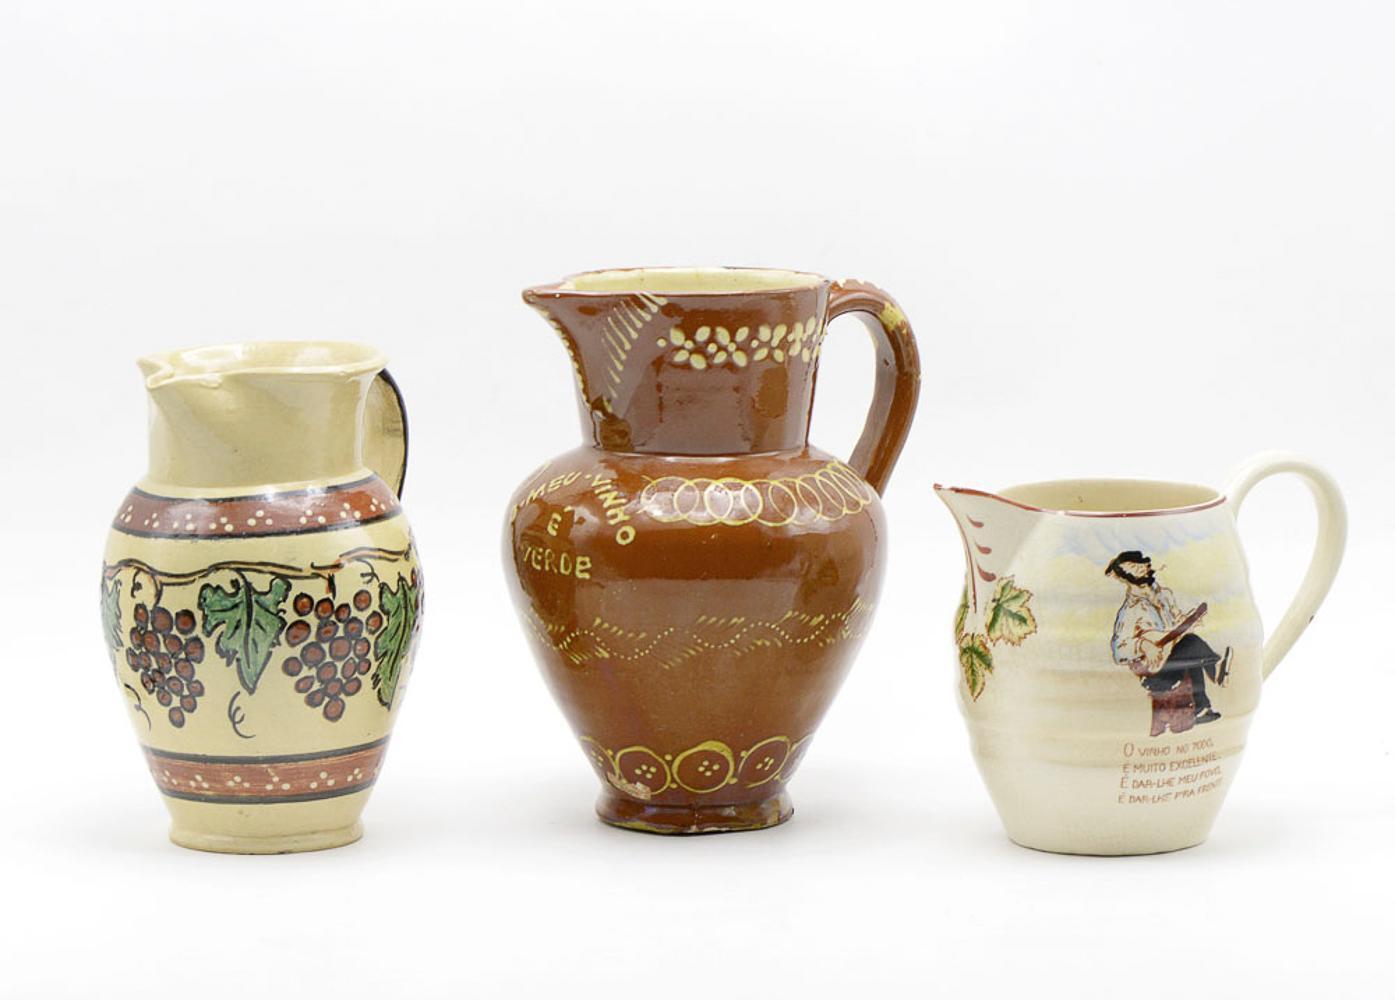 Lot of three ceramic jugs